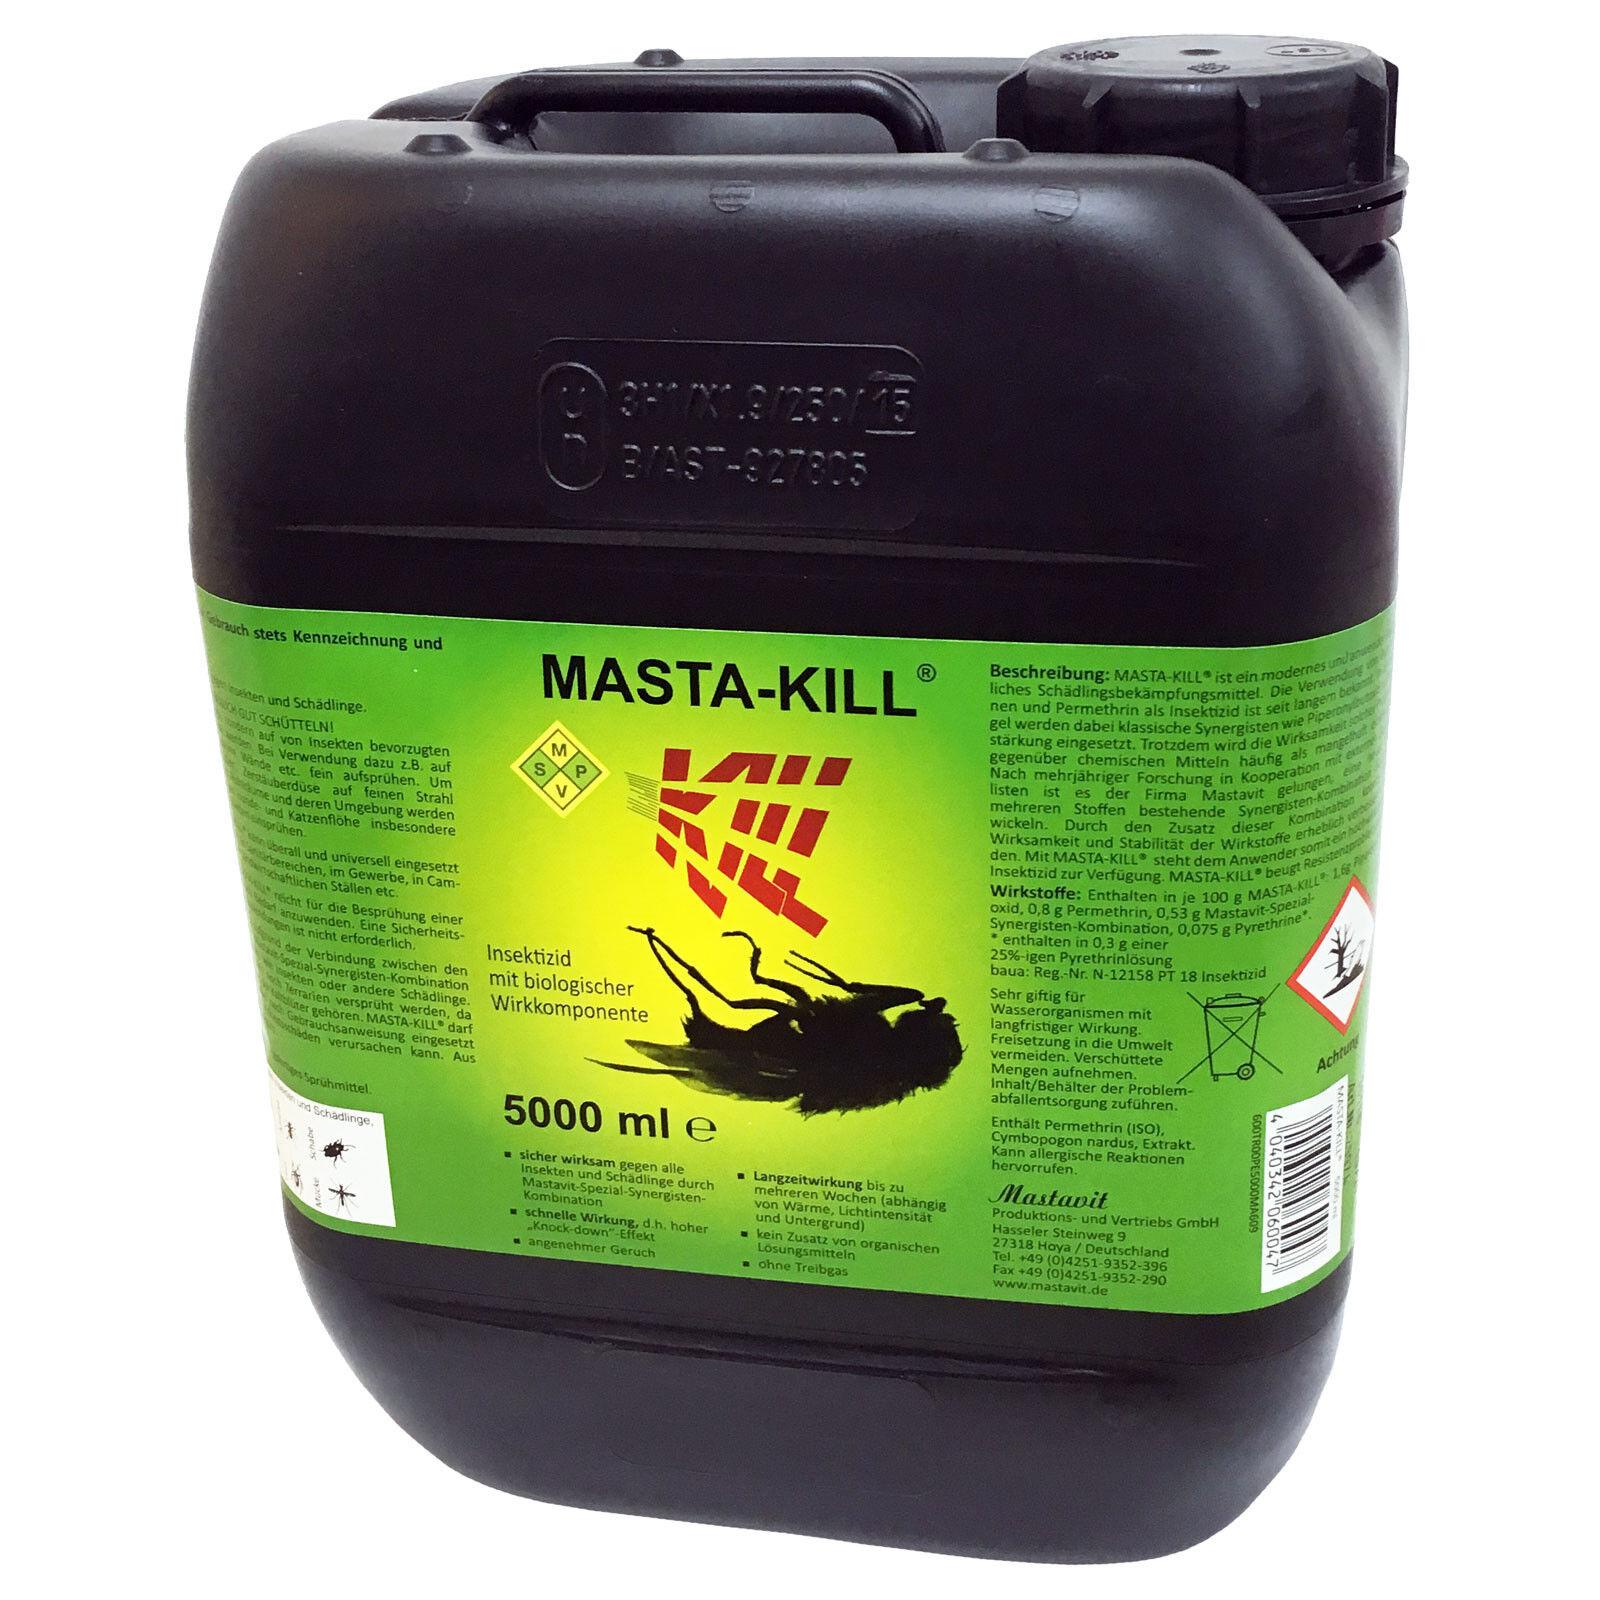 Masta Kill 5 Liter Insektenvernichter Fliegenspray Fliegenbekämpfung 5L 5 L